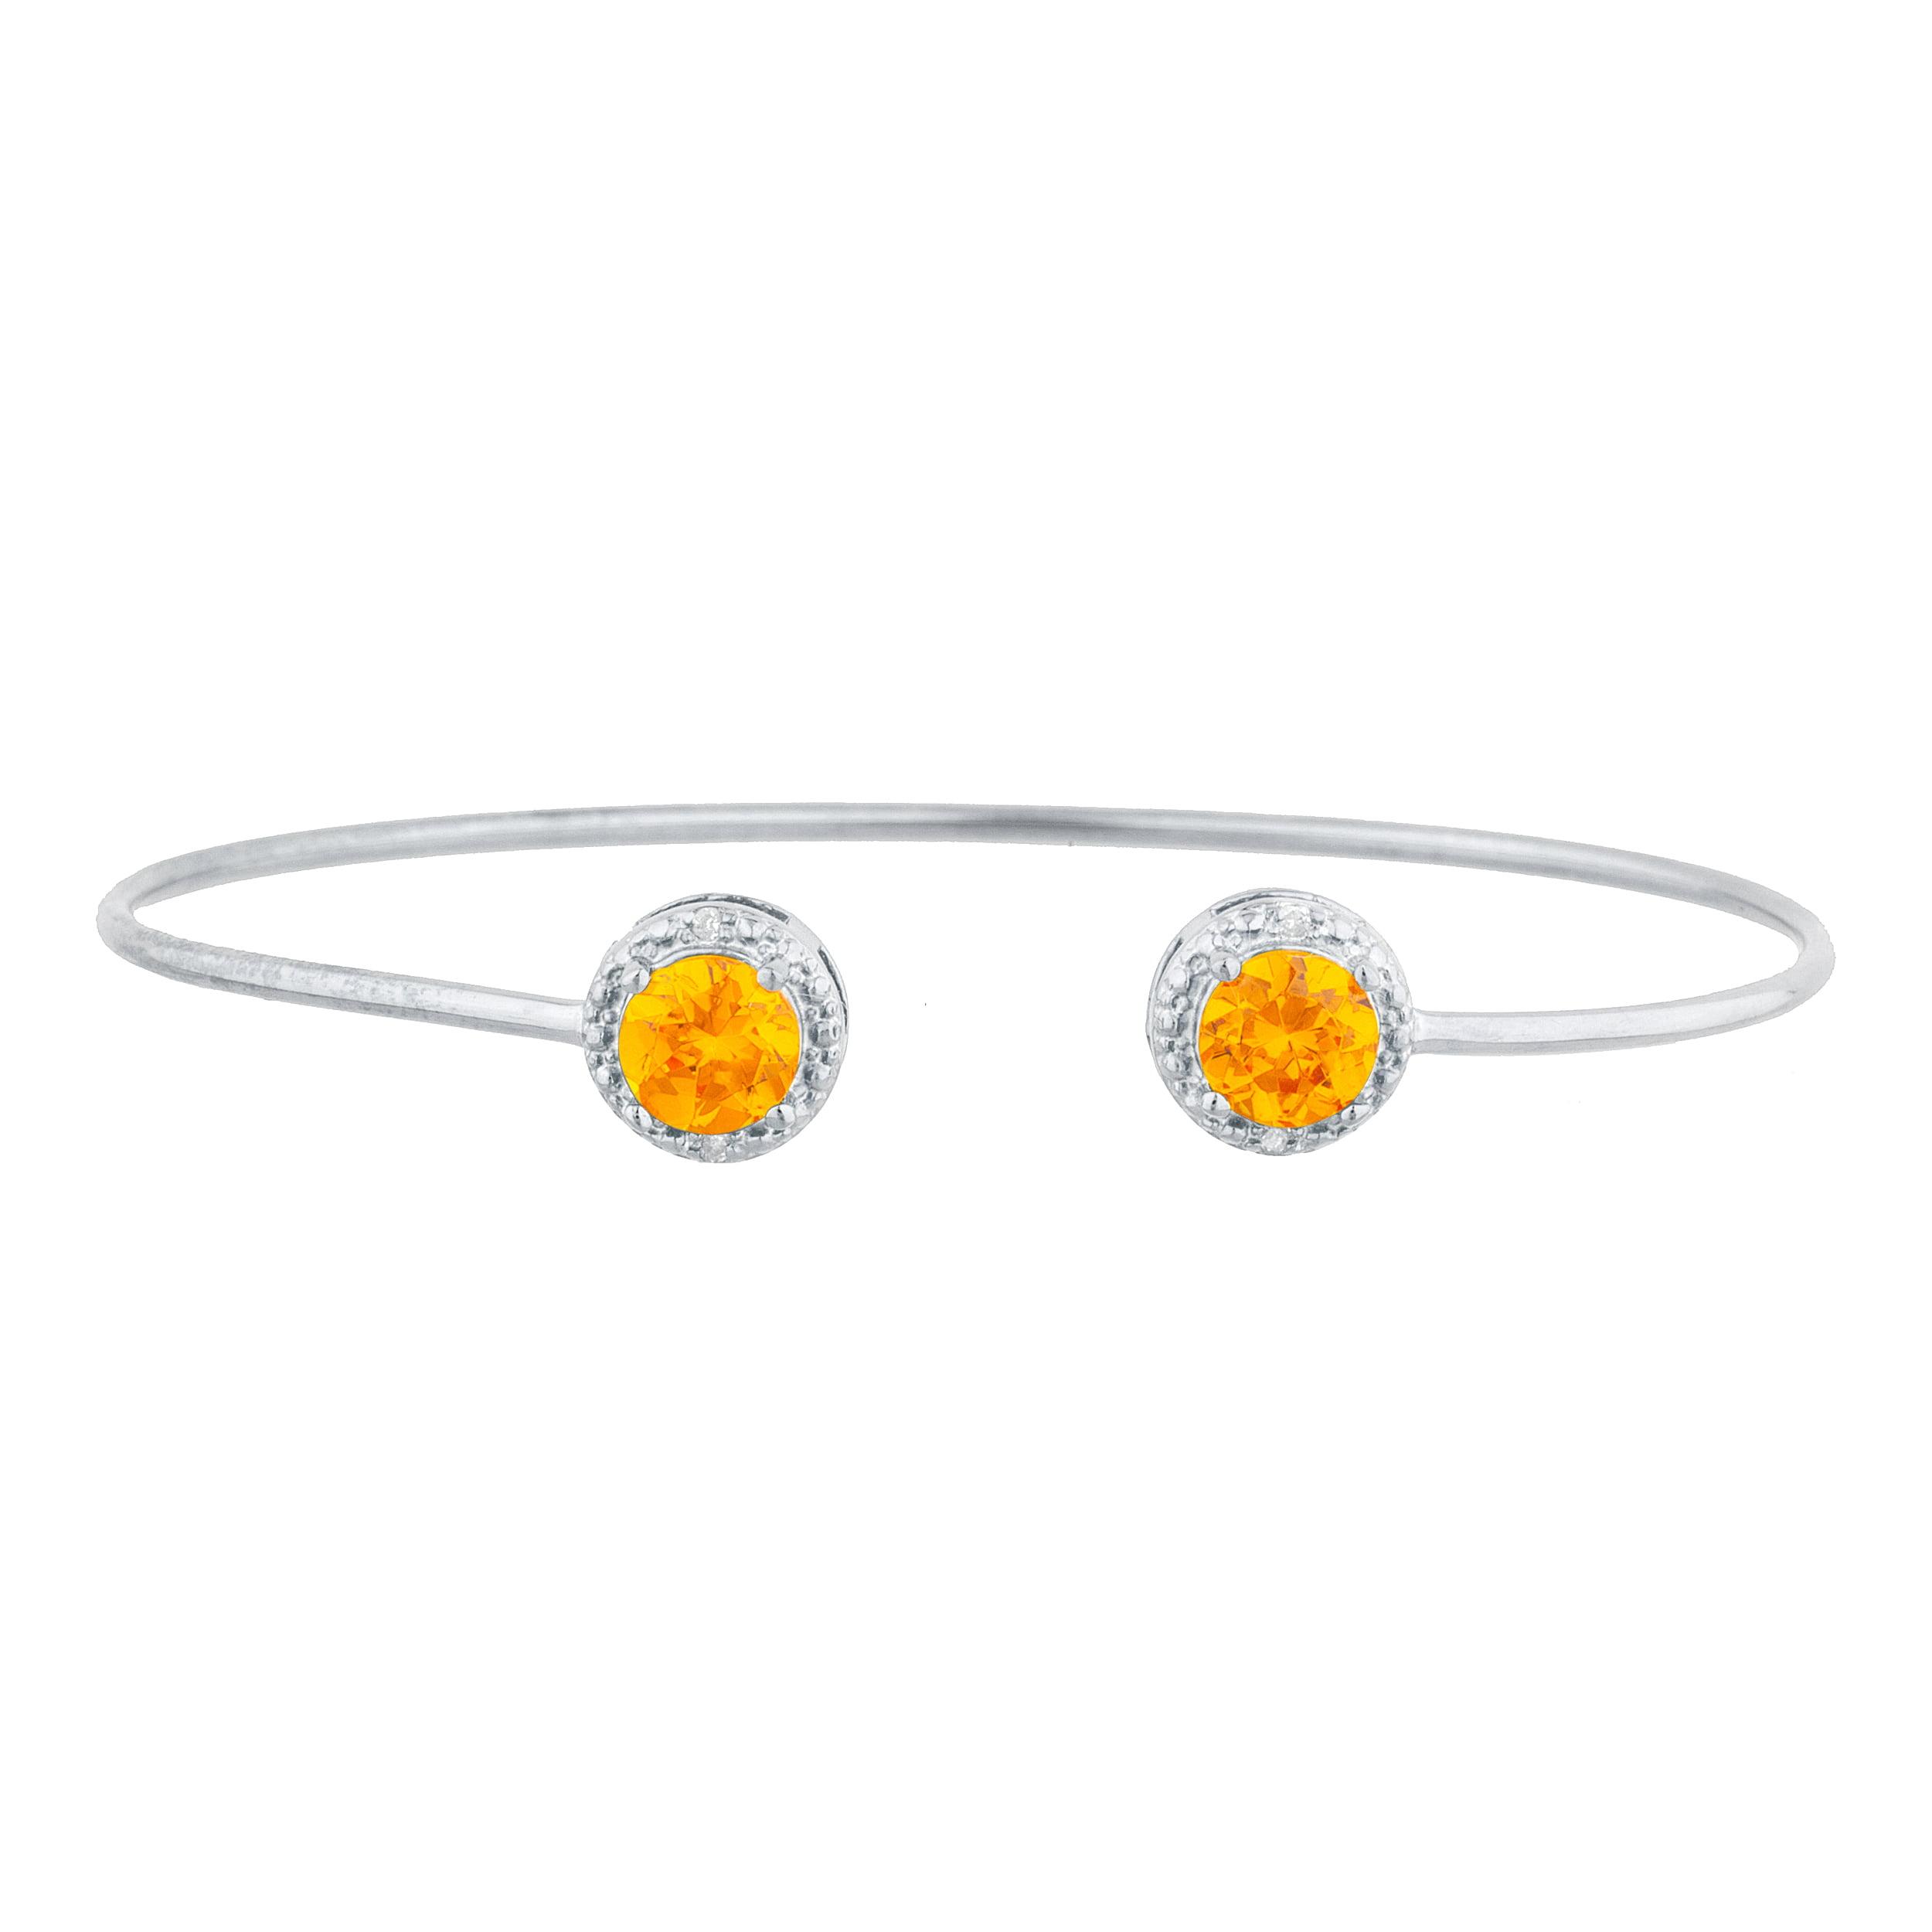 2 Ct Orange Citrine & Diamond Round Bangle Bracelet .925 Sterling Silver by Elizabeth Jewelry Inc